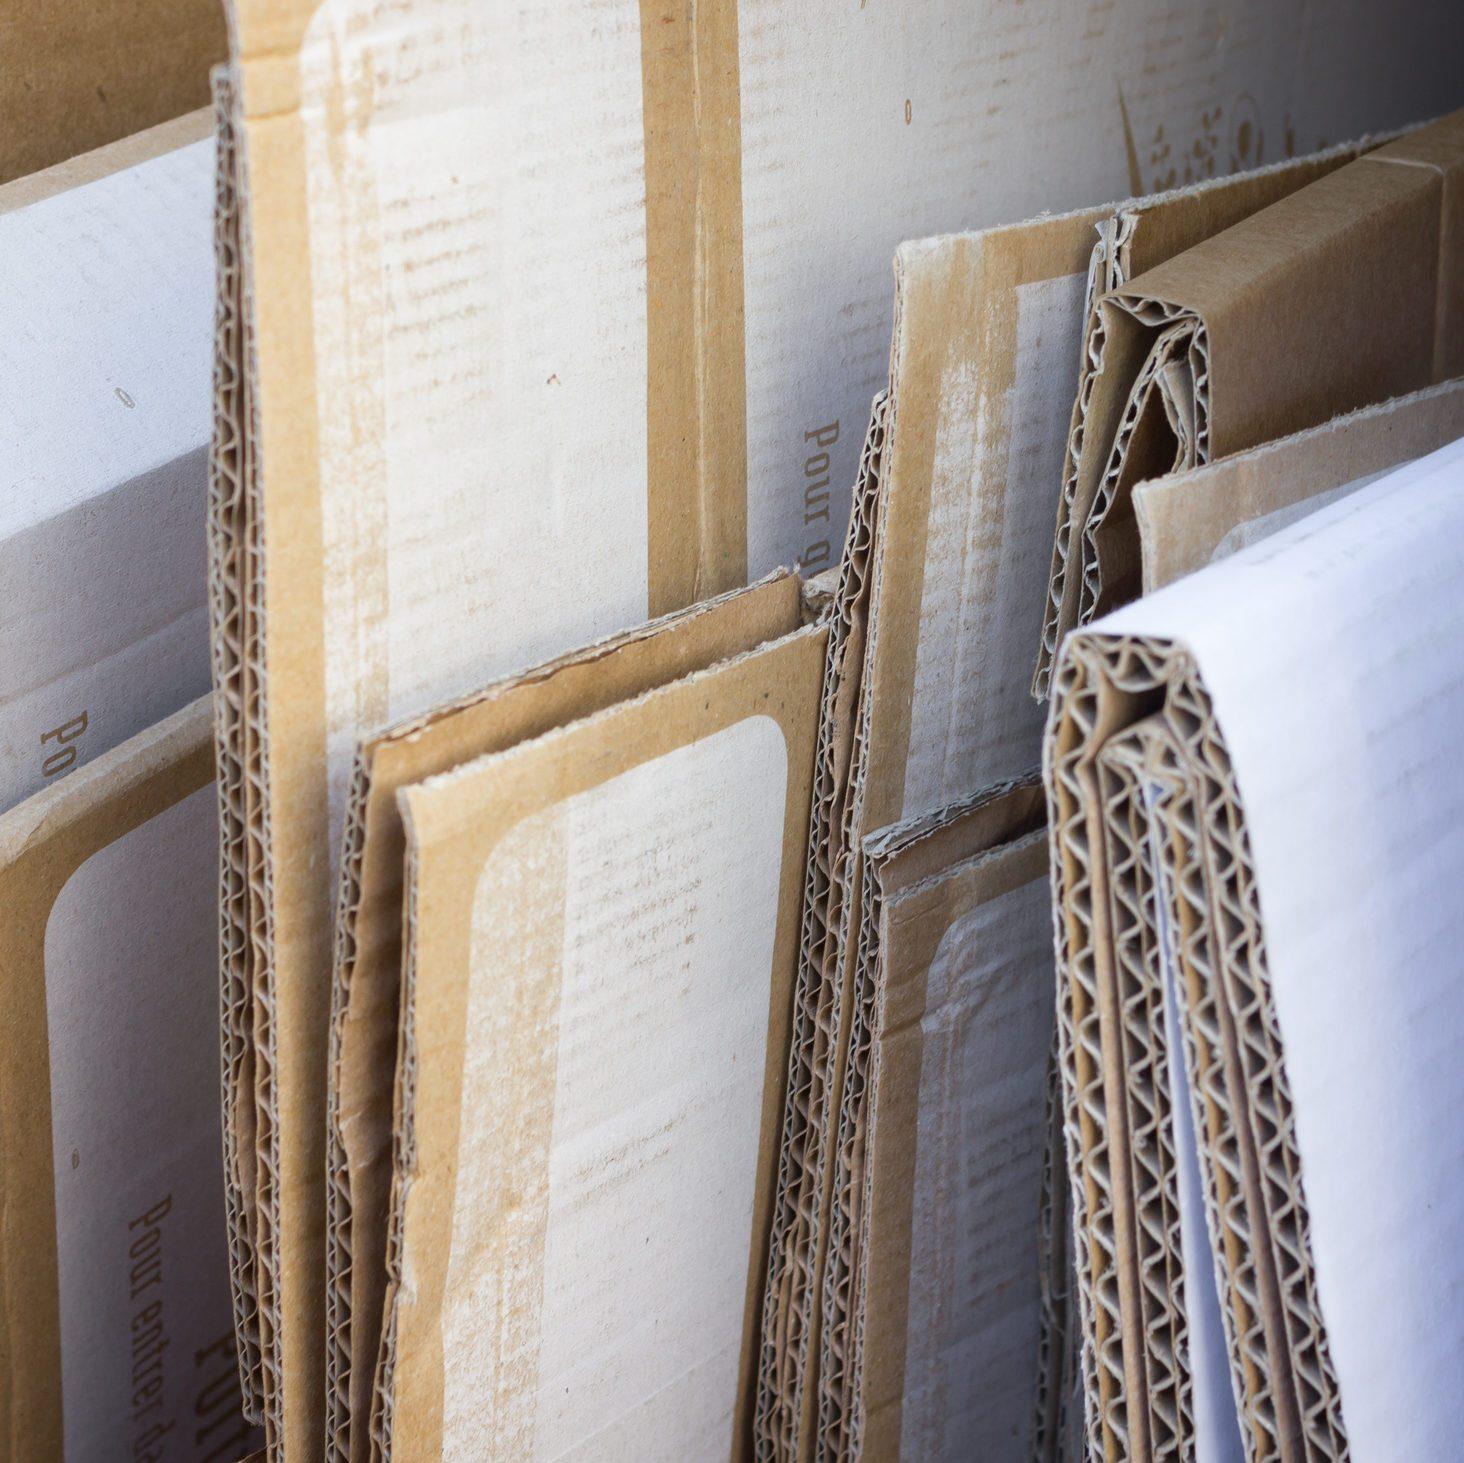 Cardboard box recycling